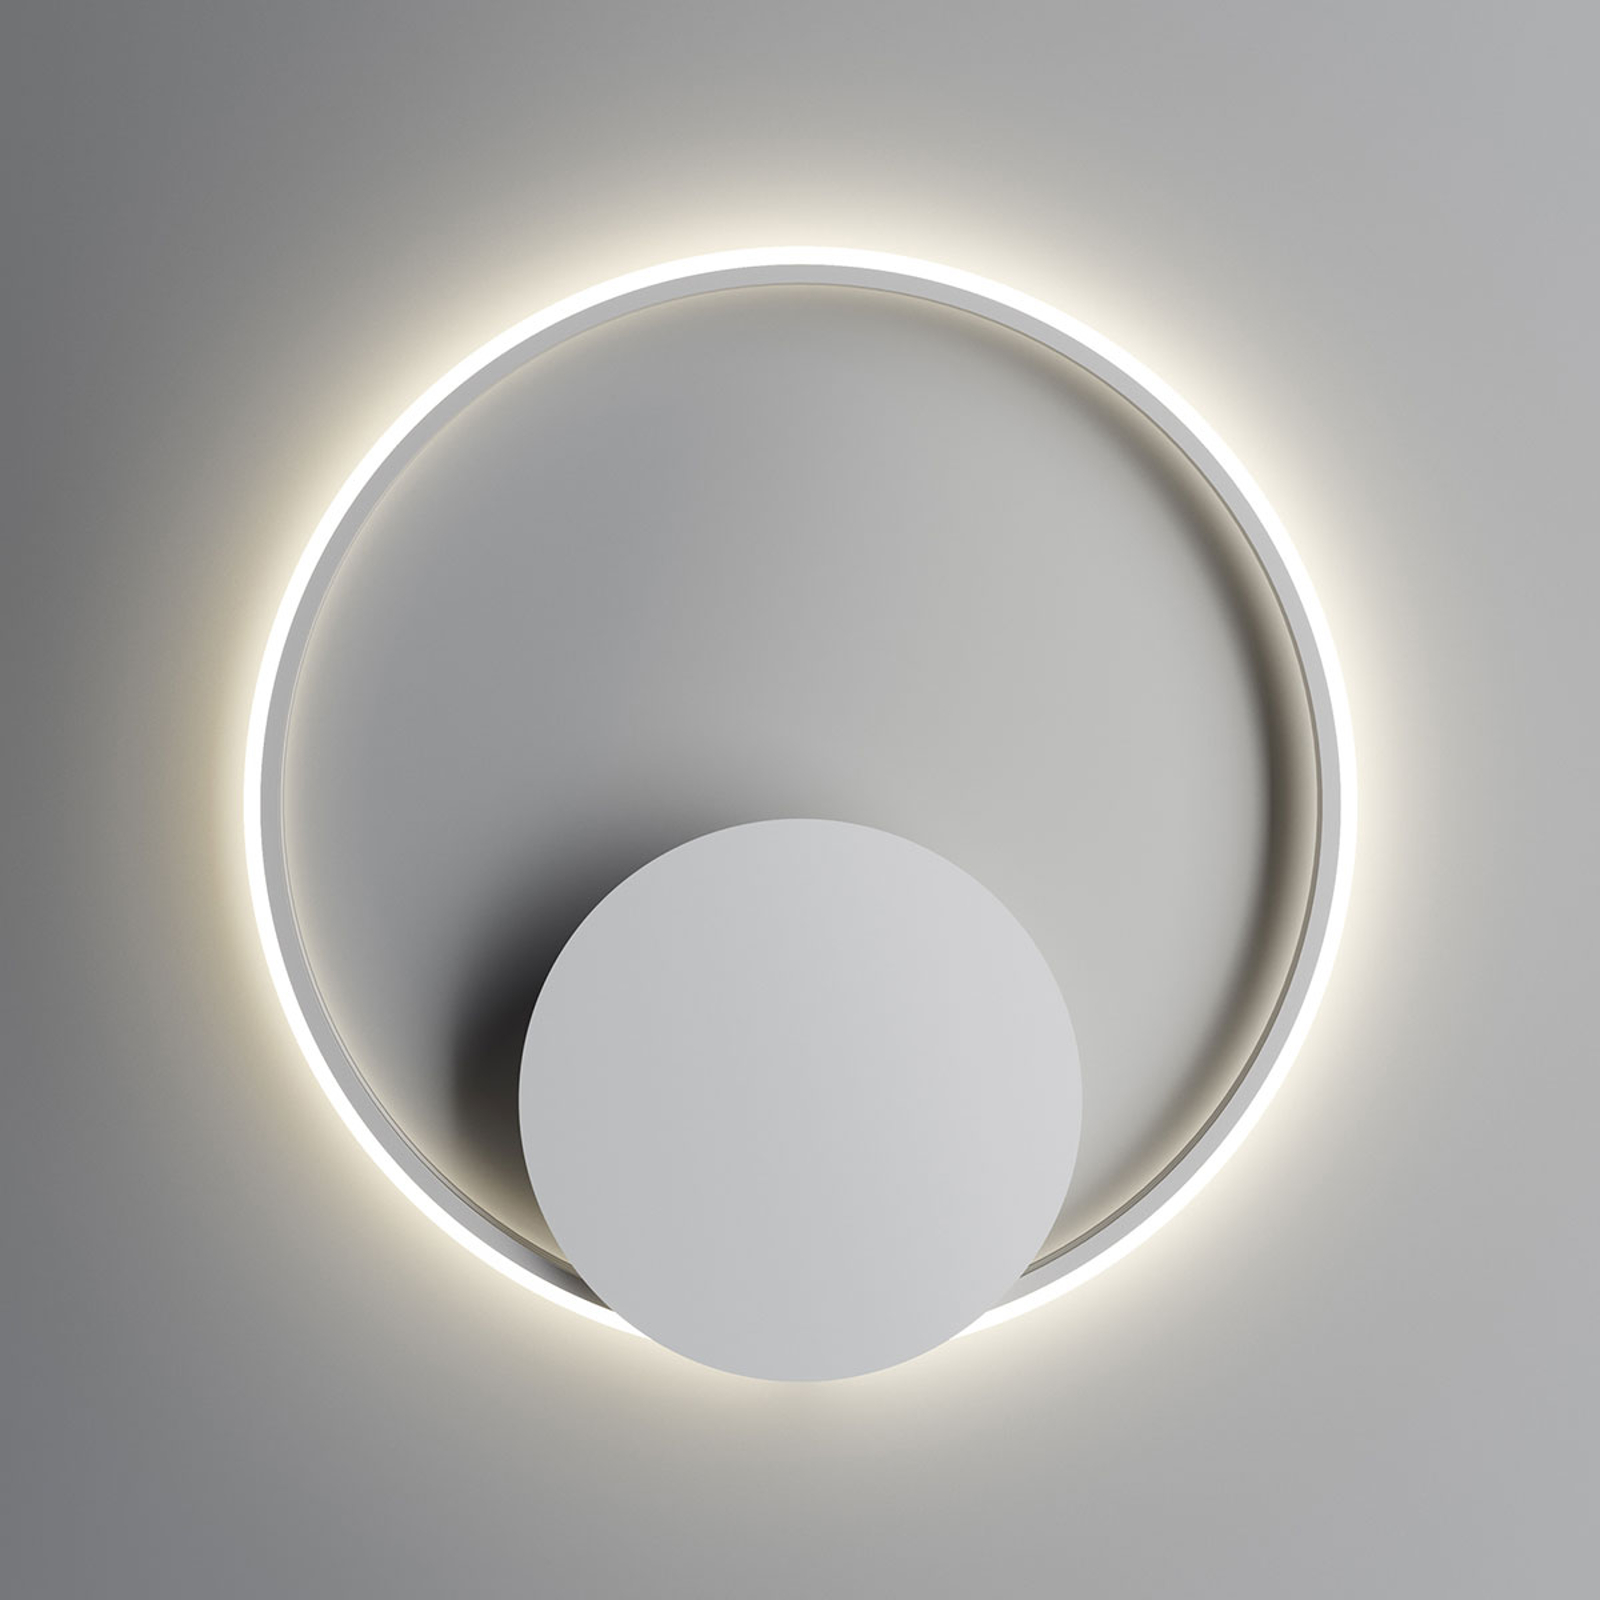 Fabbian Olympic LED-Wandleuchte Ø 60 cm weiß